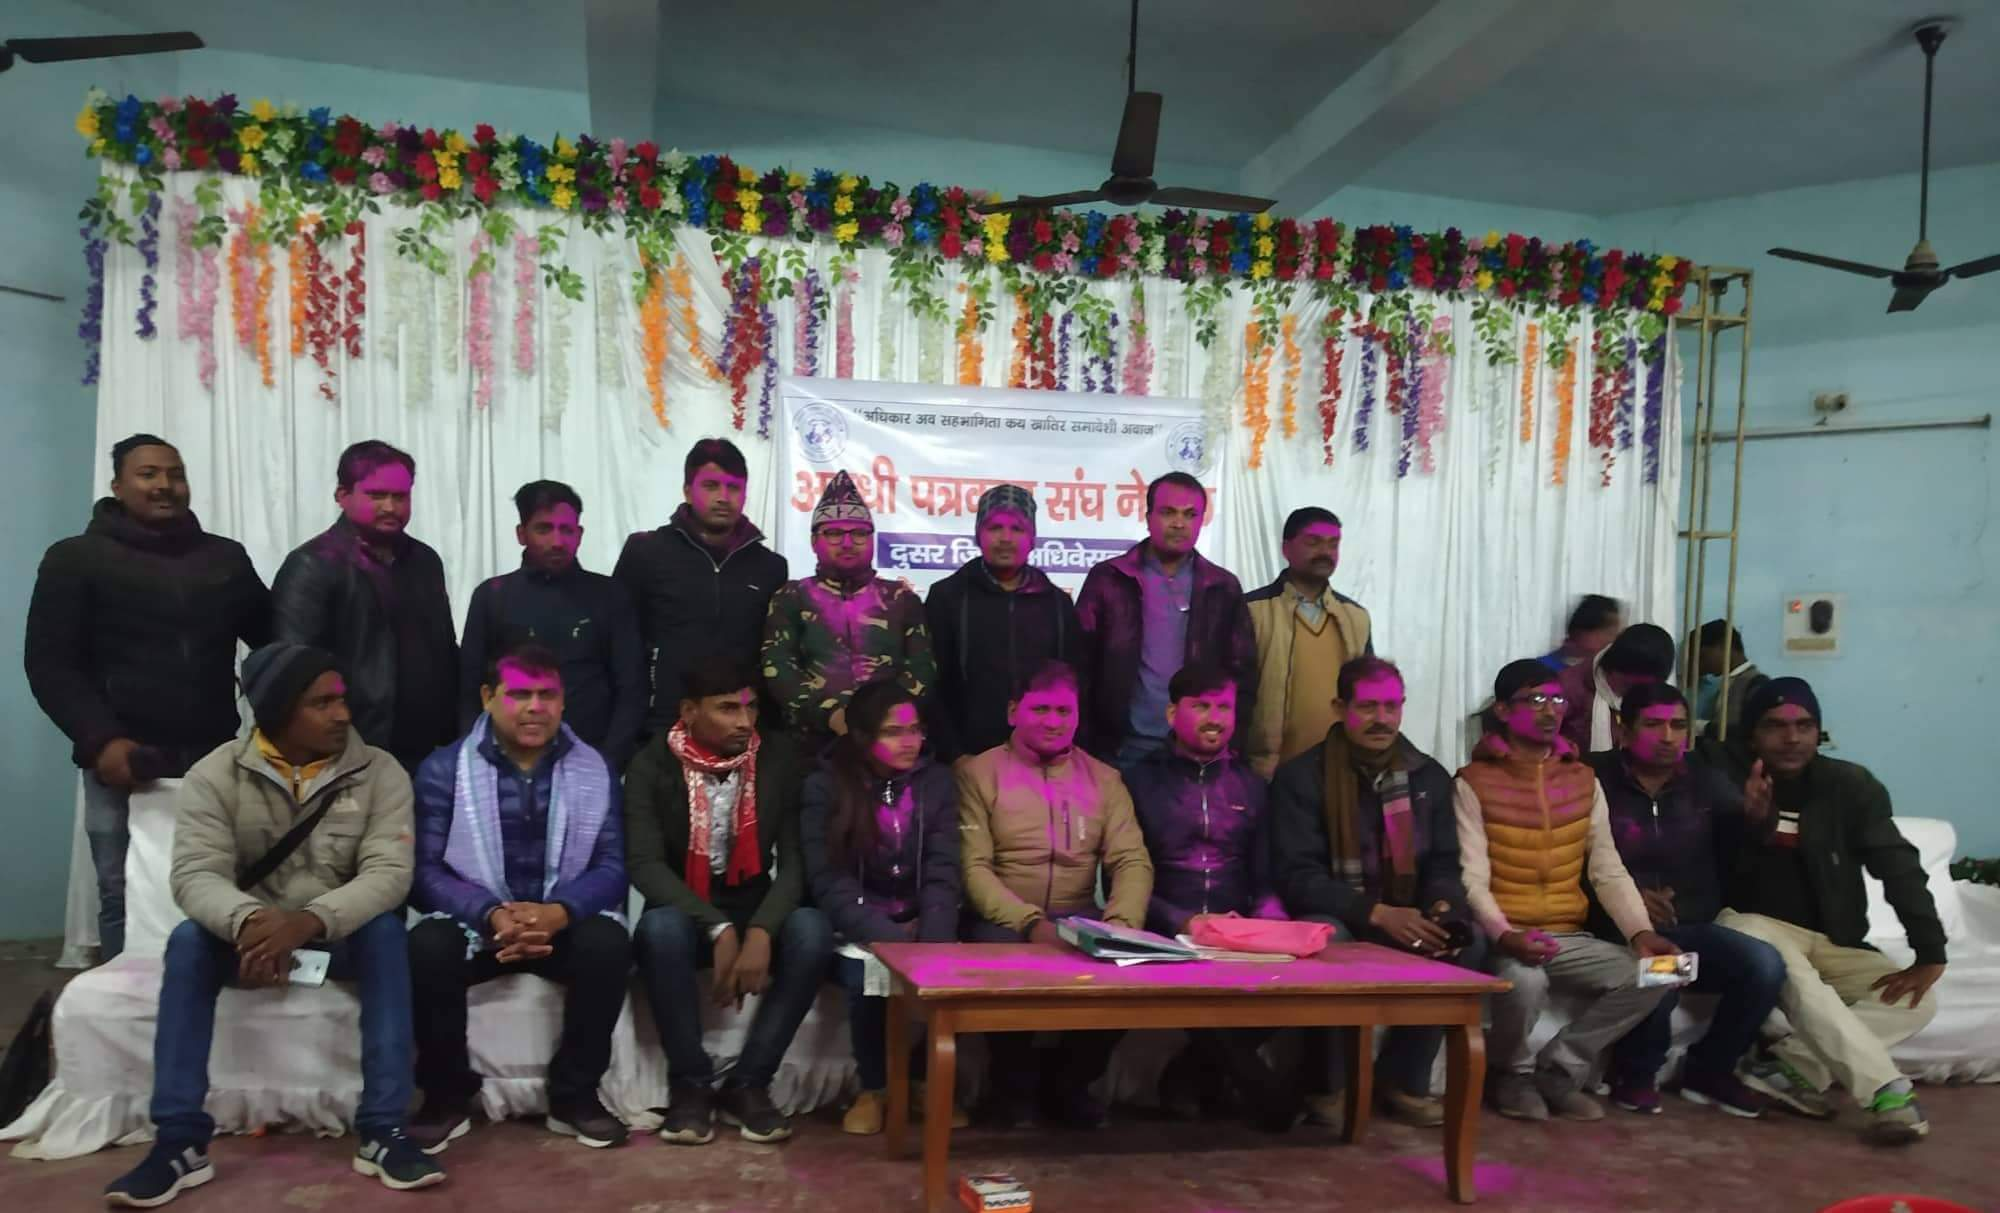 अबधी पत्रकार संघ नेपाल कपिलवस्तुको अध्यक्षमा यादव निर्वाचित